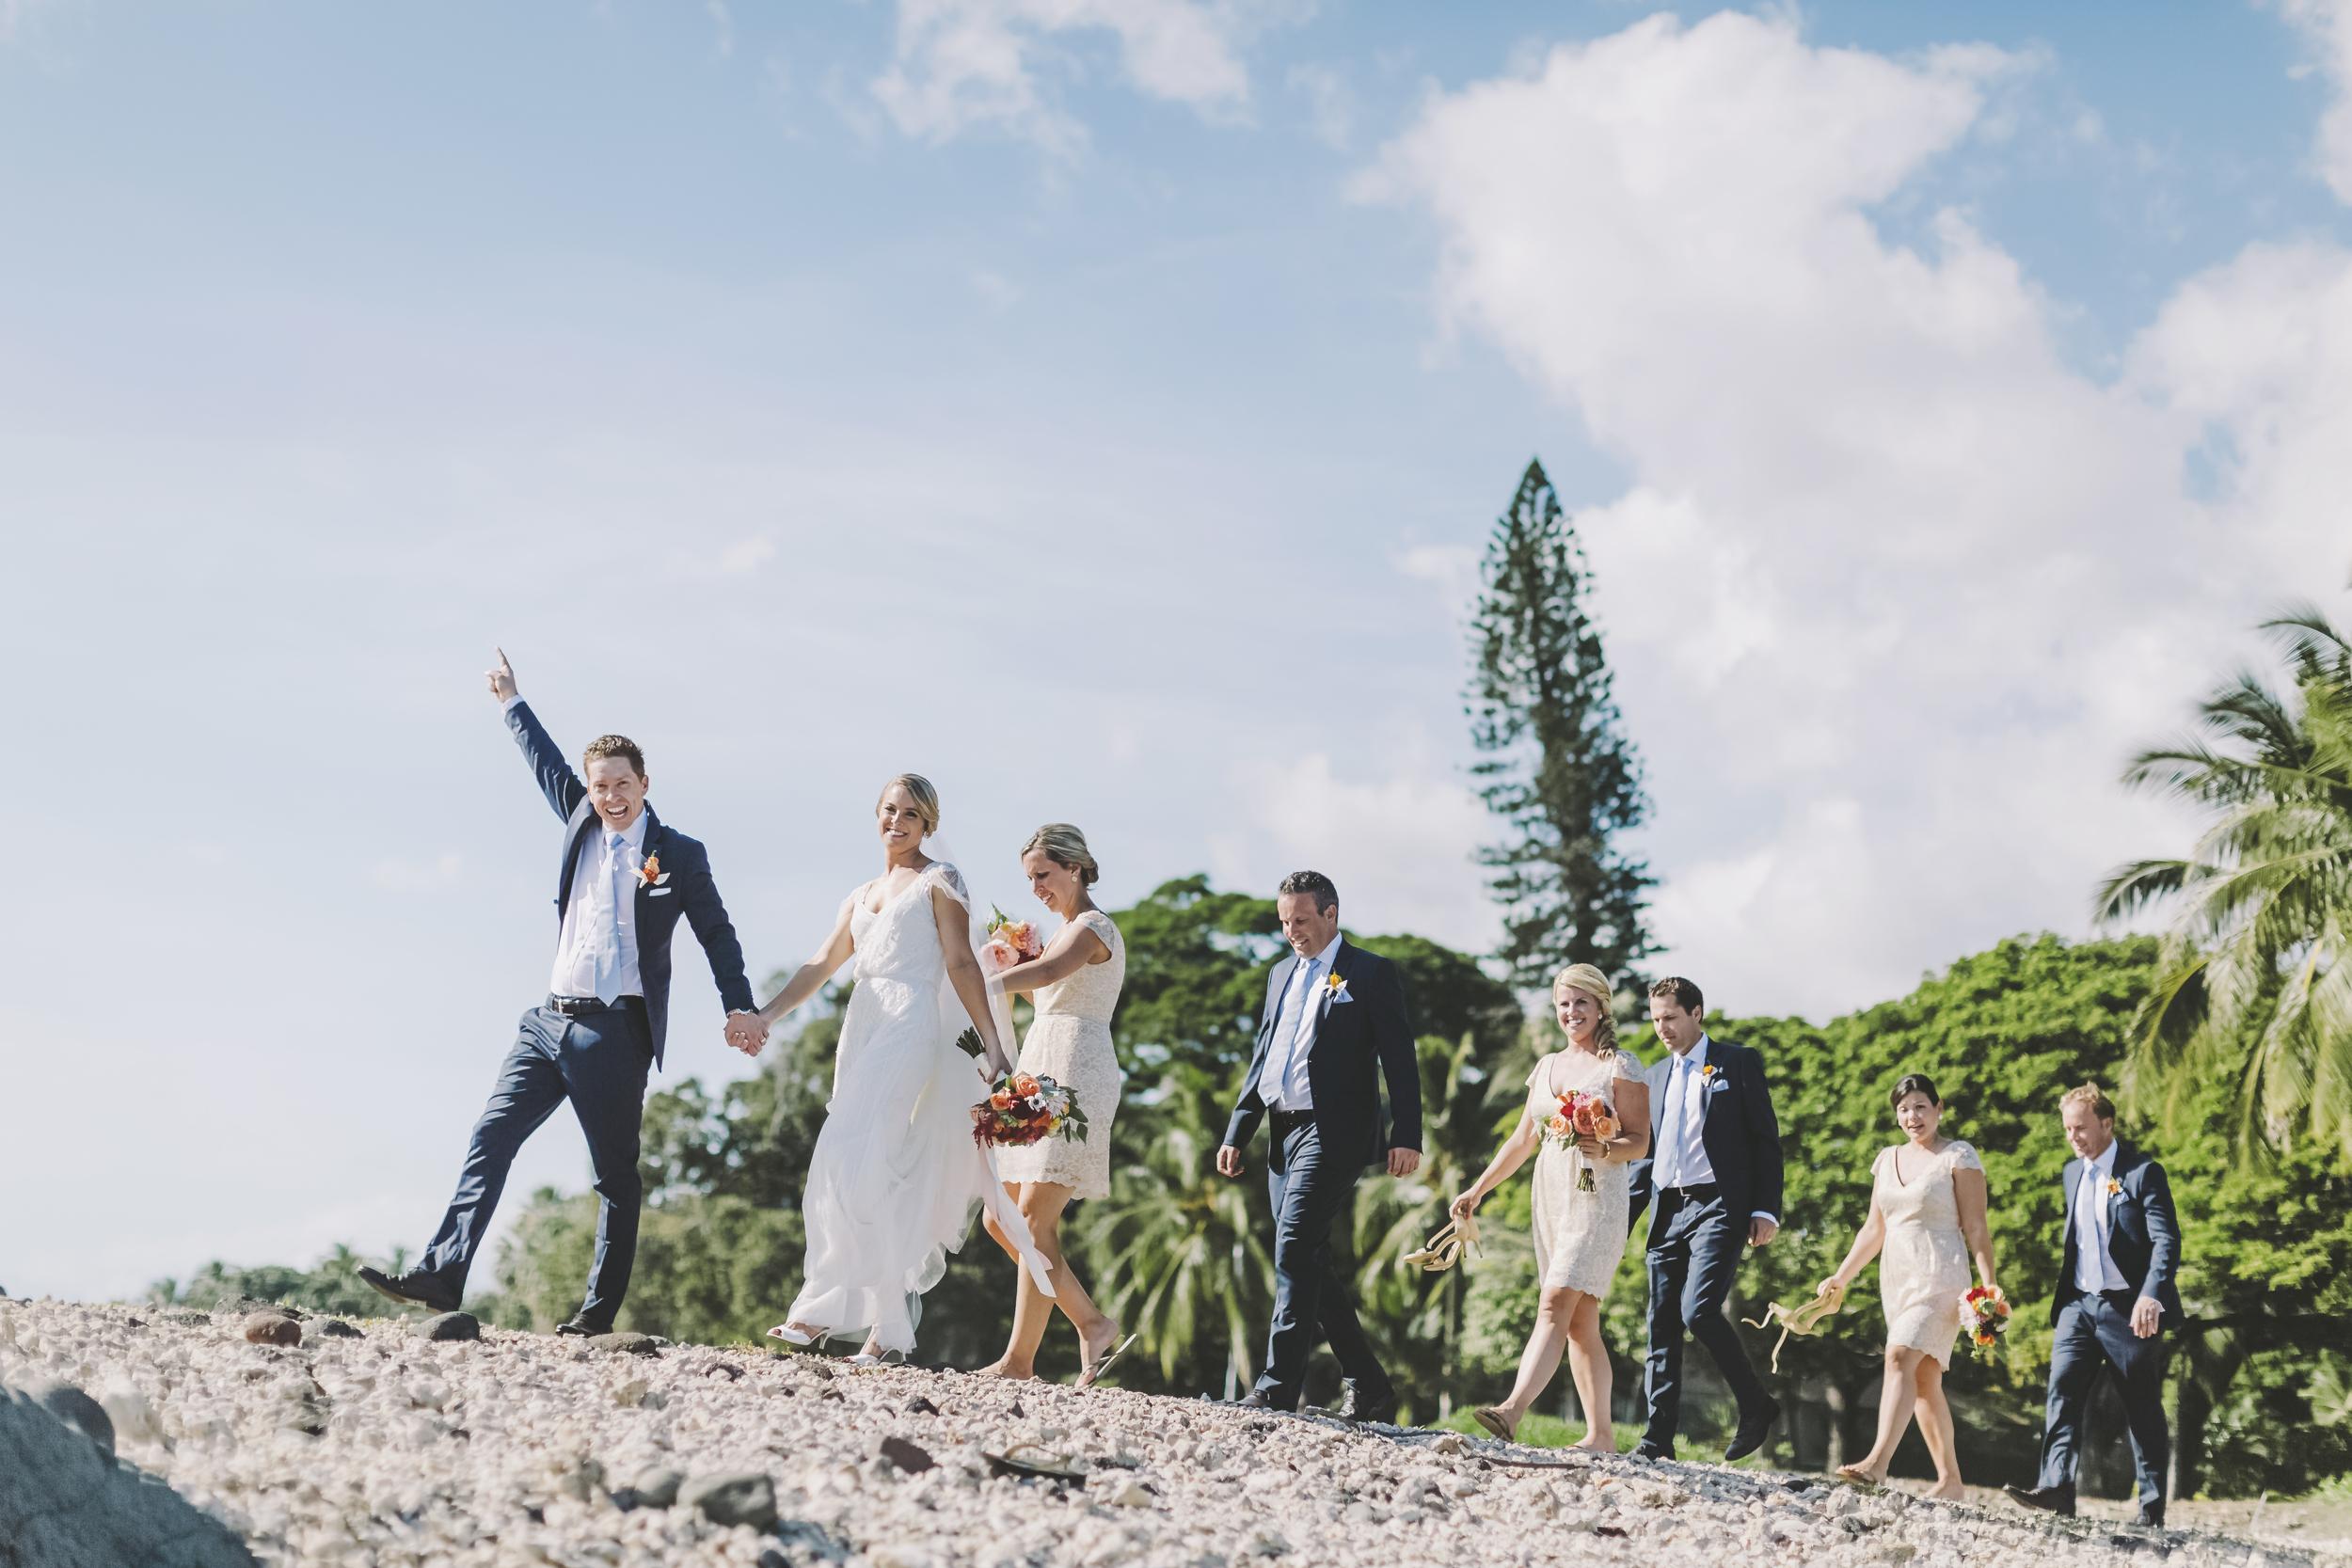 angie-diaz-photography-maui-wedding-mel-matt-54.jpeg